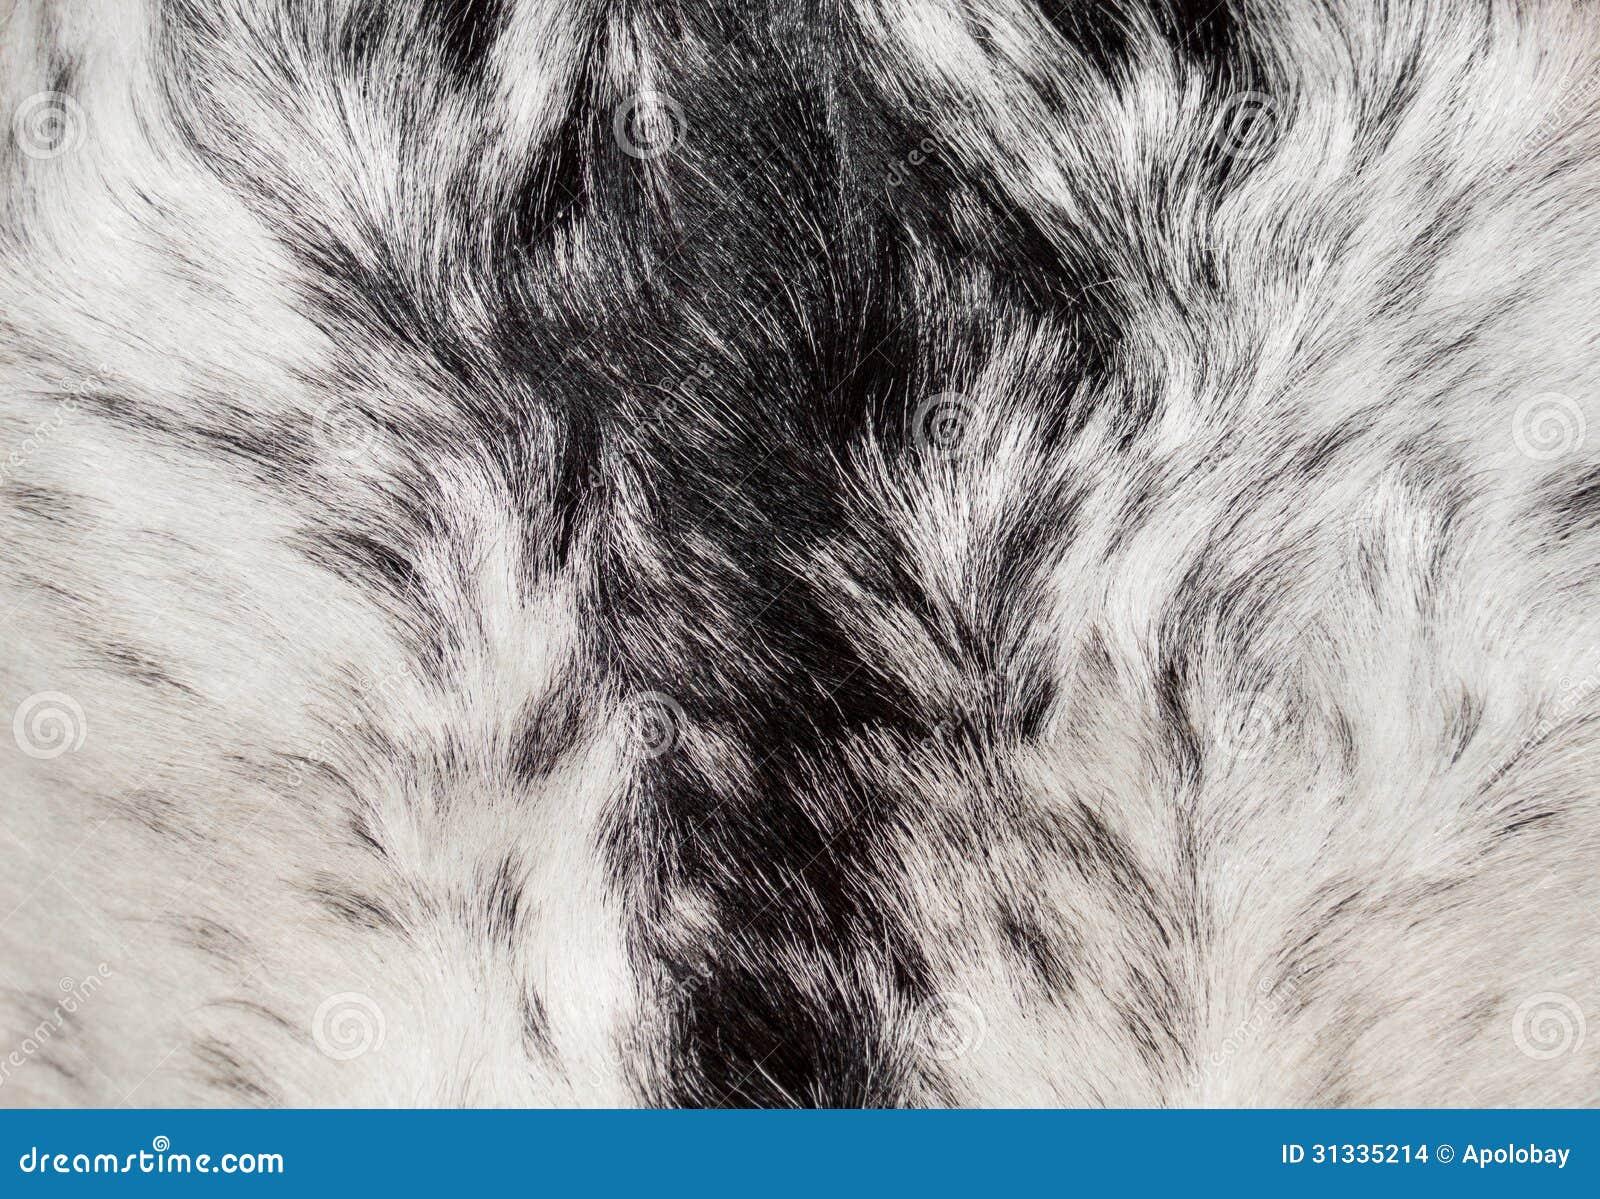 texture fur animal background - photo #21